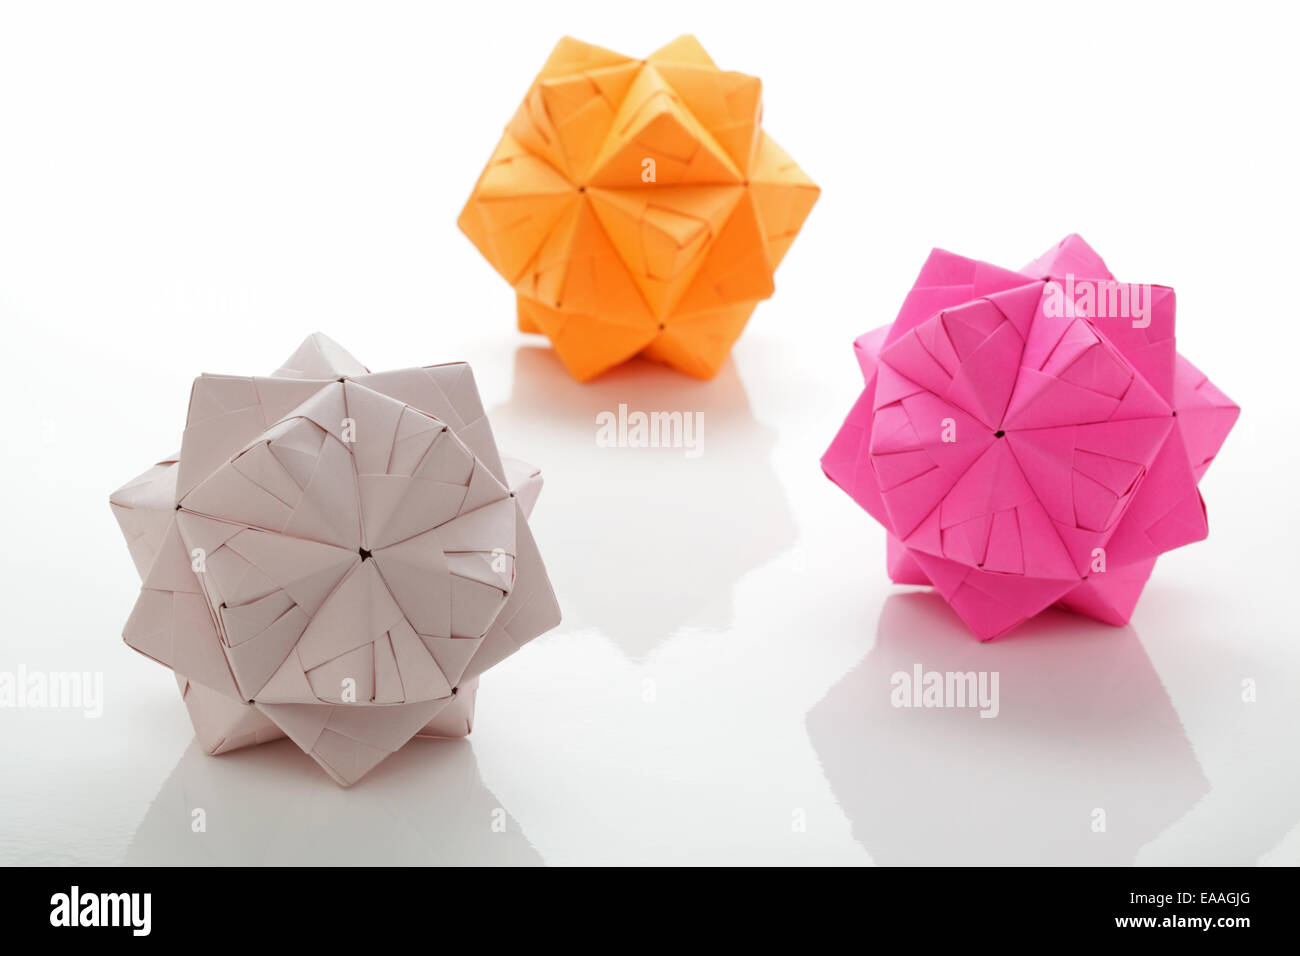 Drei geometrischen modulare Origami facettenreiche Kugeln Stockbild